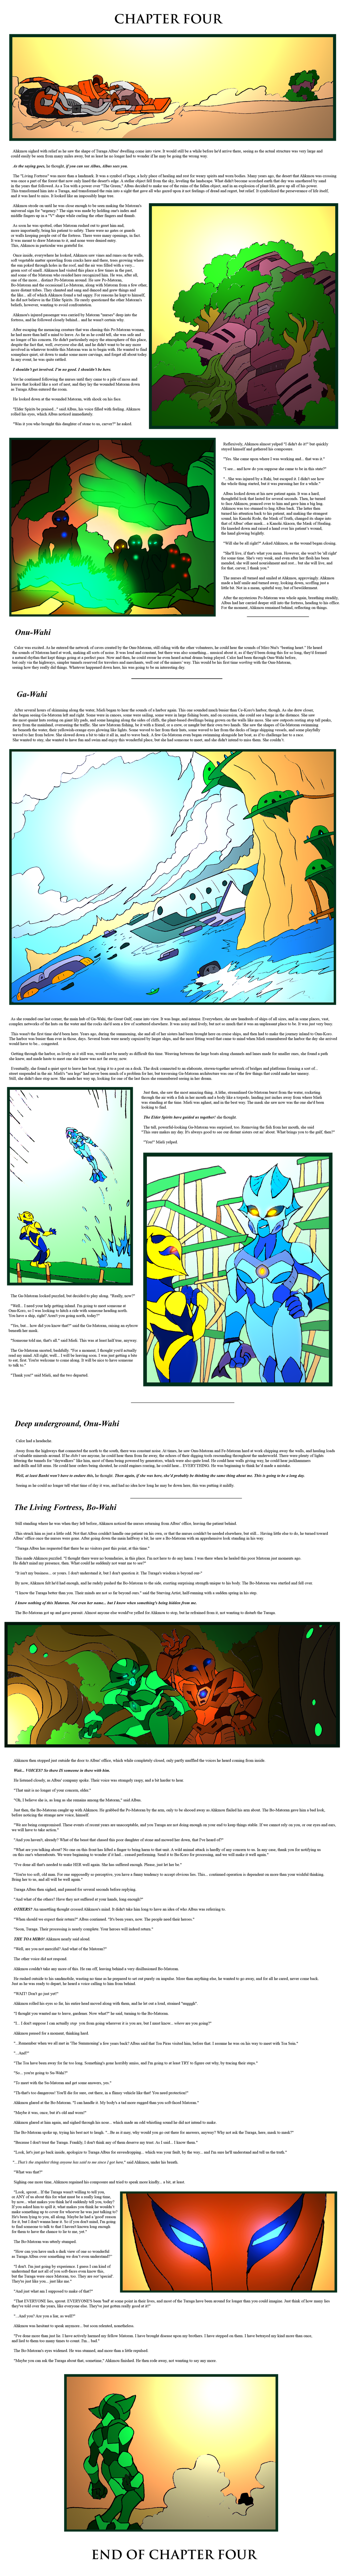 Bionicle- Nova Orbis- Mystery- Chapter 4